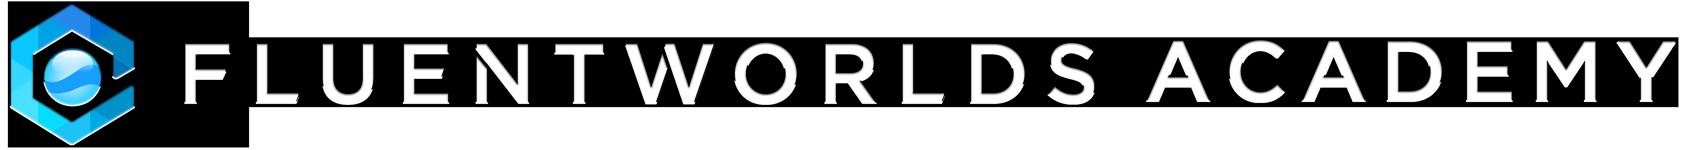 academy.fluentworlds.com